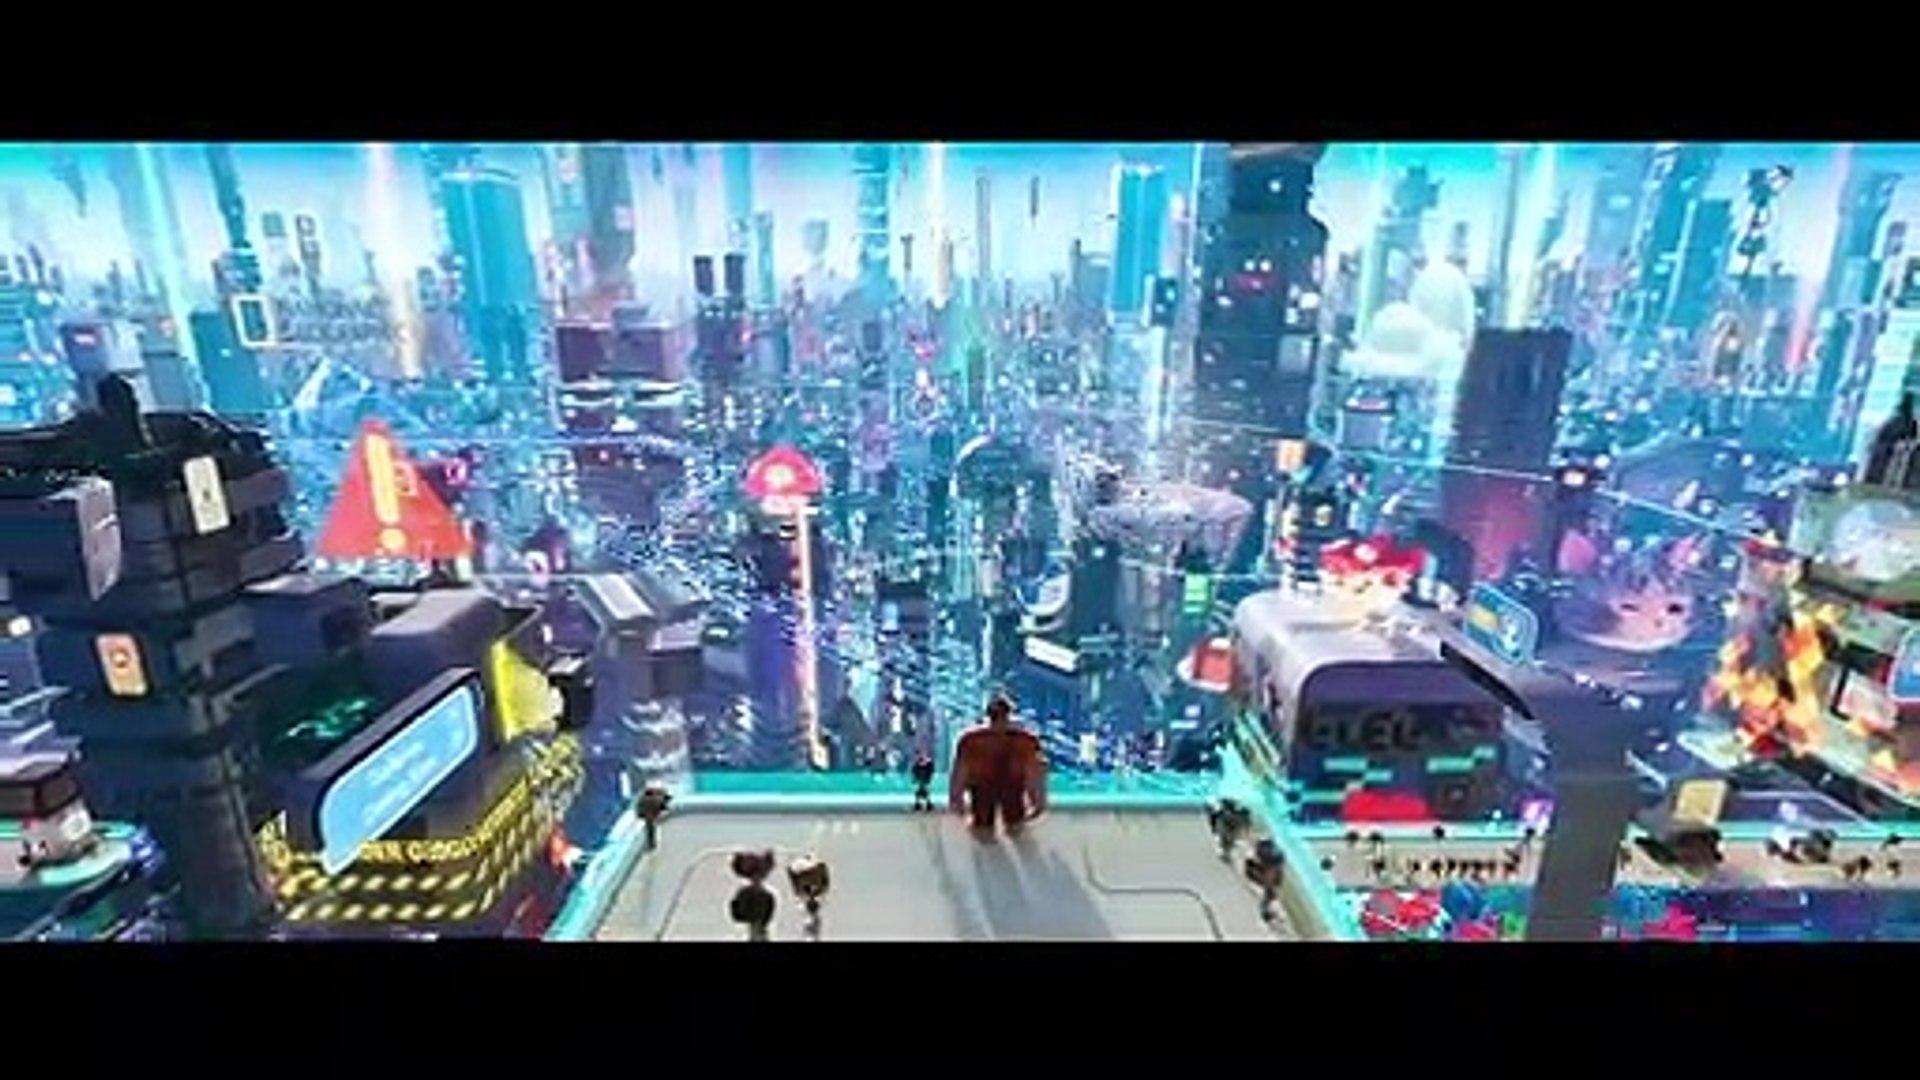 Ralph Breaks the Internet  International Trailer (2018) - Movieclips Trailers